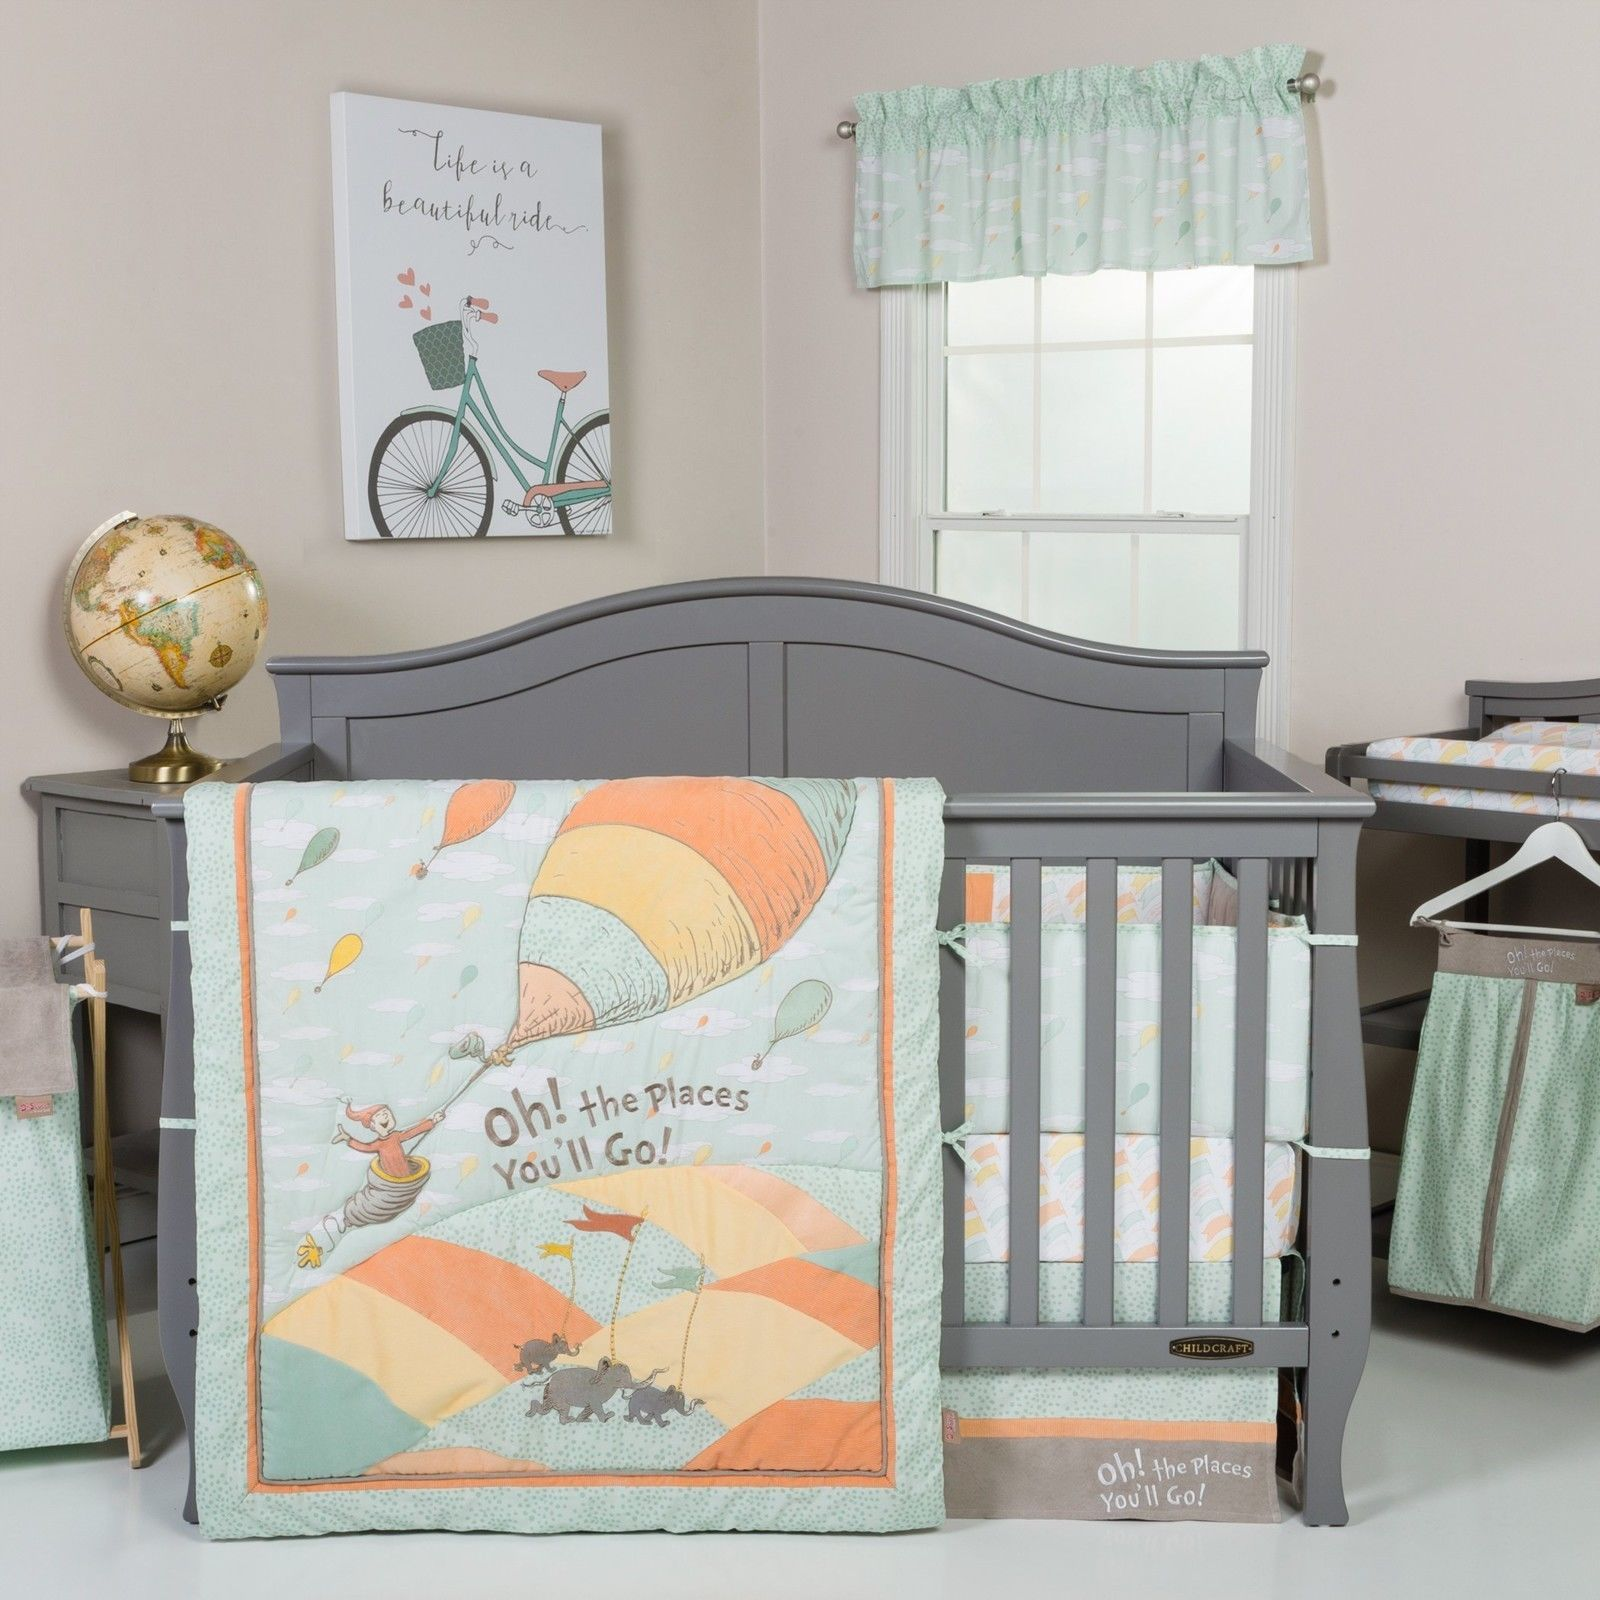 Nursery Toddler Crib Bedding Set Excellent Quality Reversible Unisex 5 Pieces Baby Crib Bedding Sets Crib Bedding Sets Baby Crib Bedding